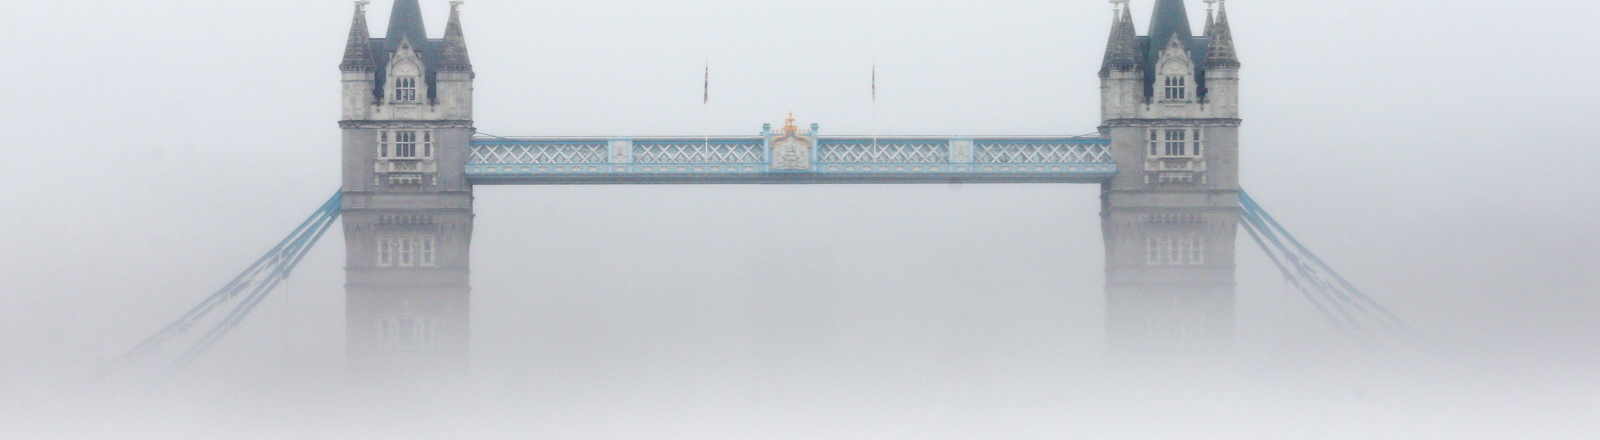 Die Tower Bridge im Nebel